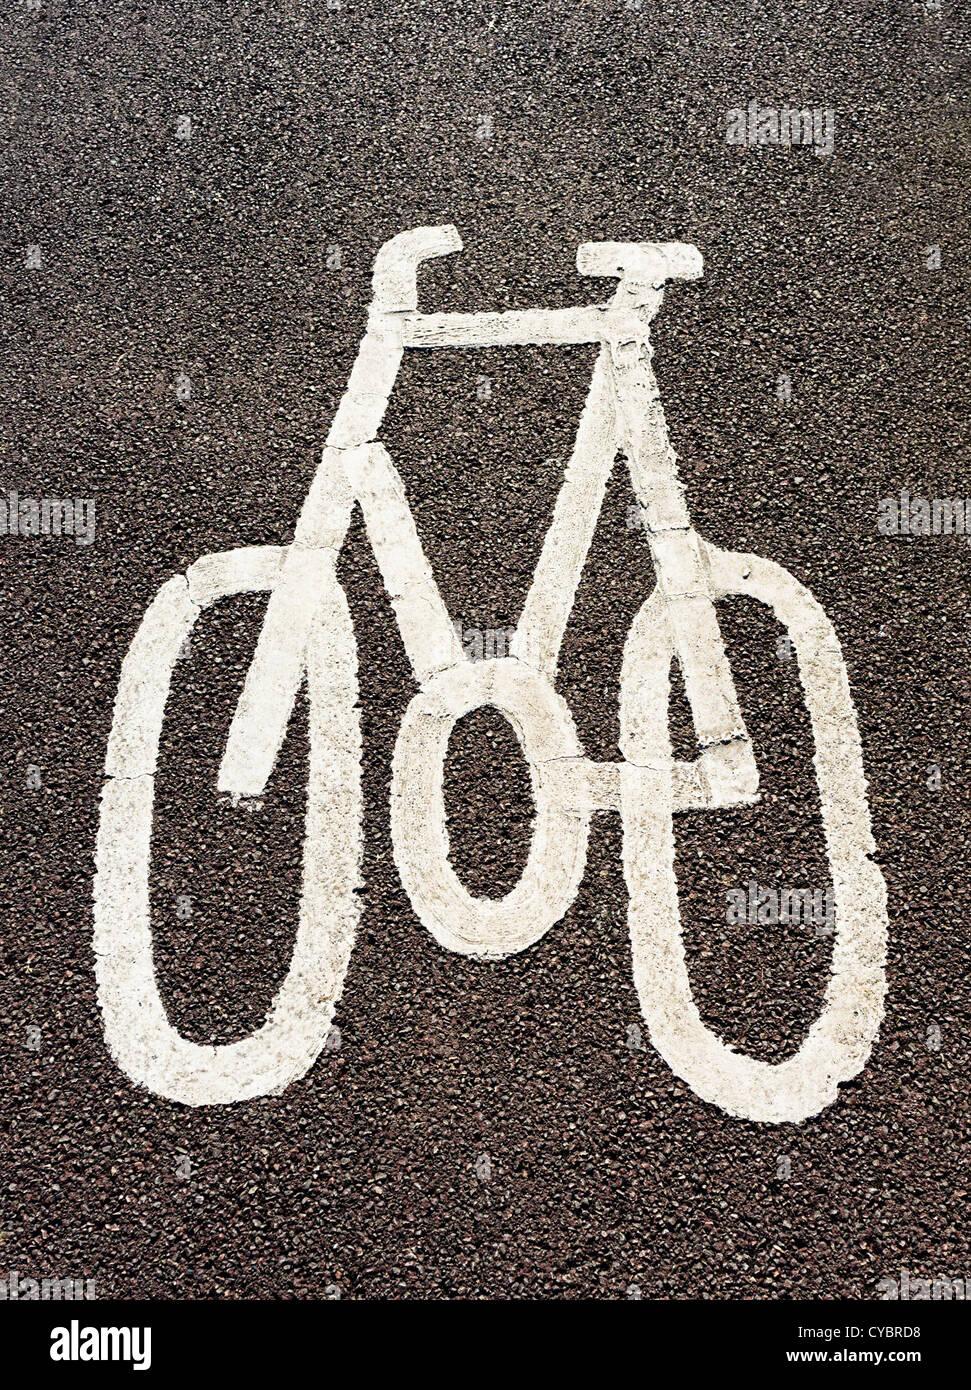 Cycle path logo, UK - Stock Image